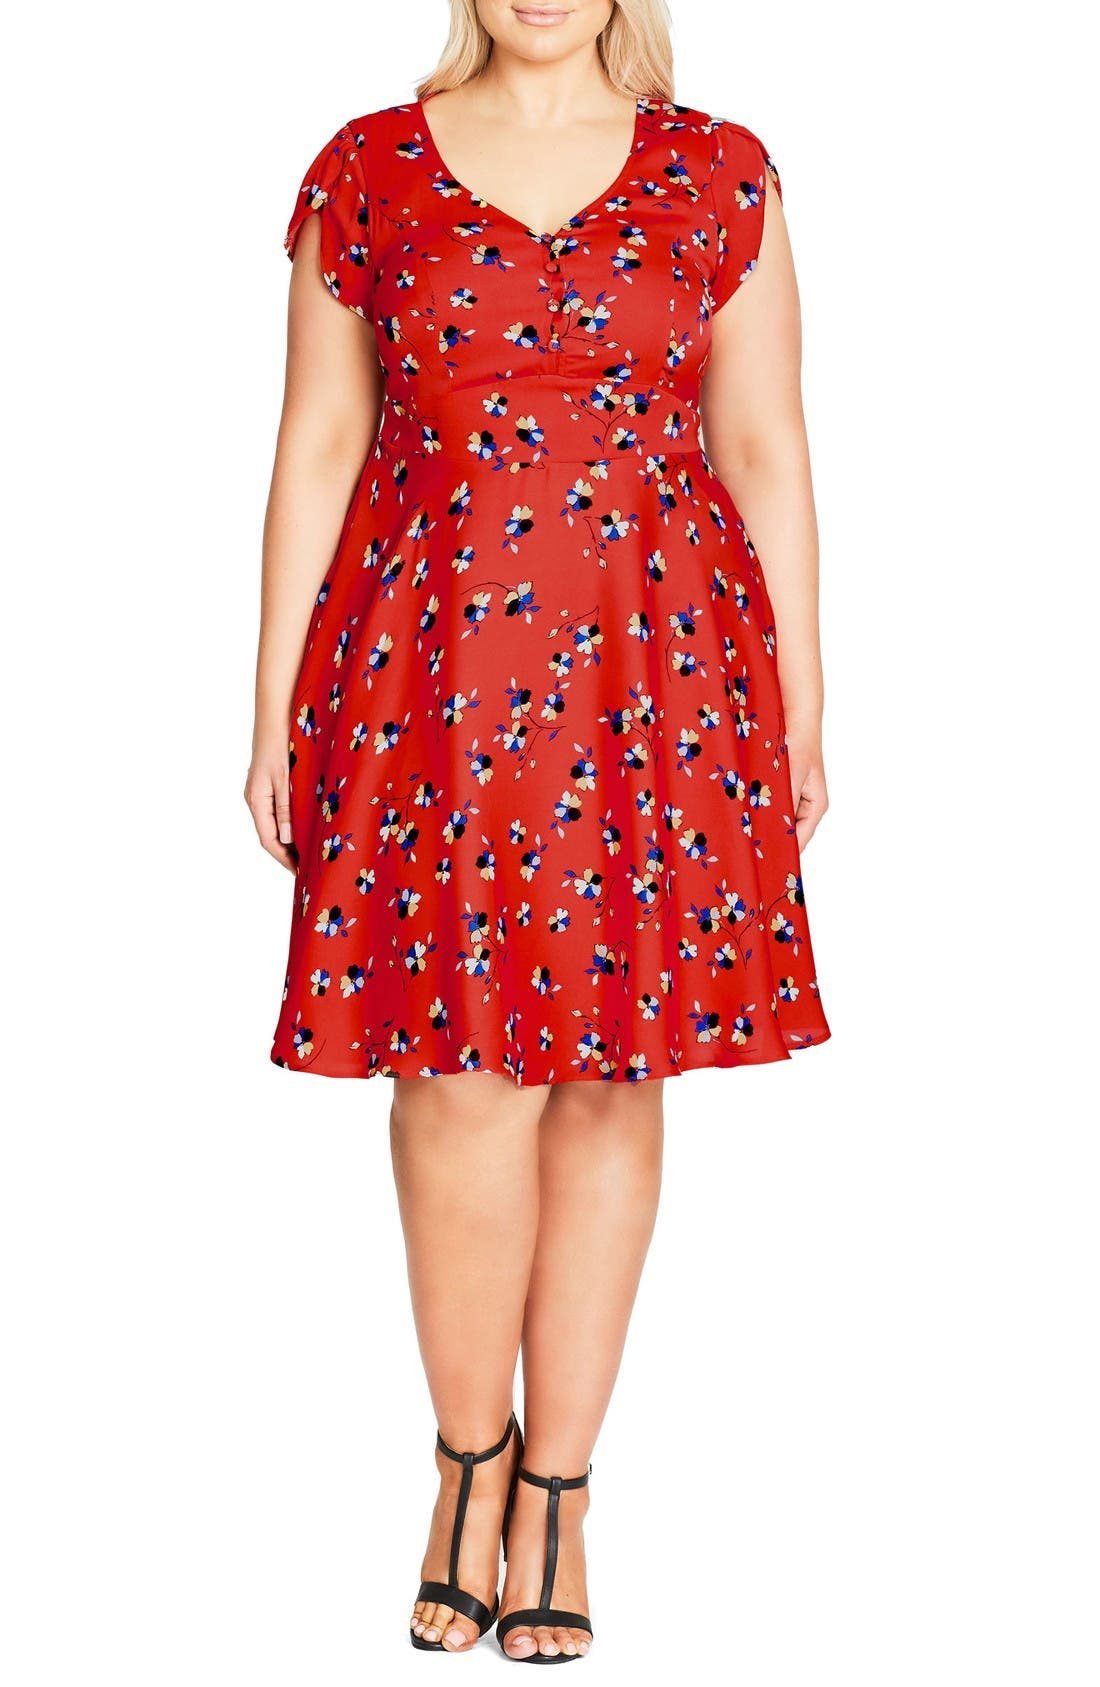 Alternate Image 1 Selected - City Chic Cutie Pie Fit & Flare Dress (Plus Size)